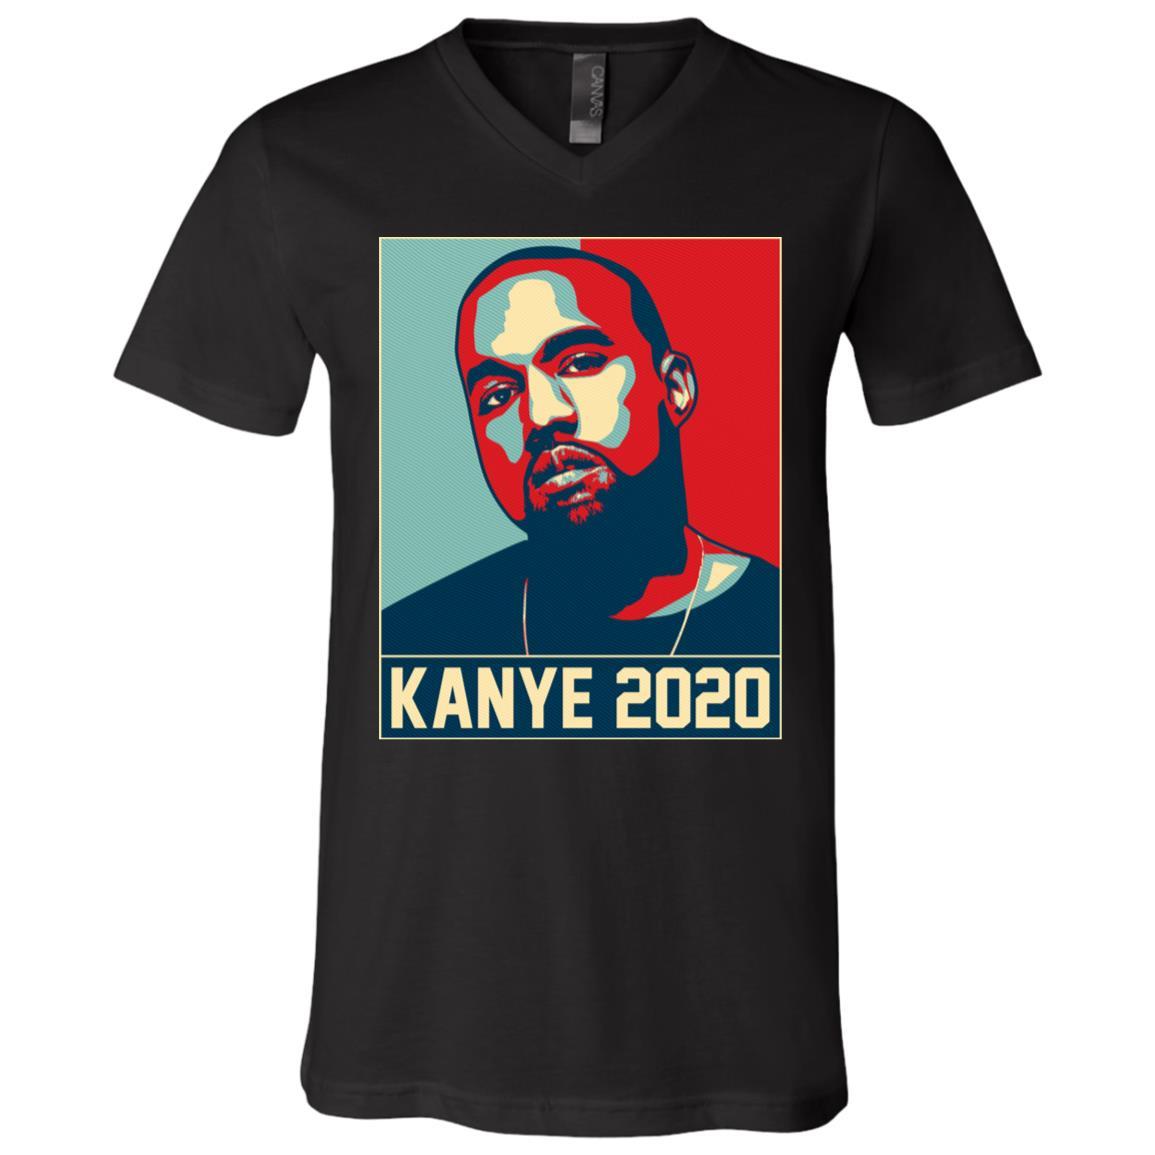 Kanye For President 2020 Shirt Kanye West For President 2020 Hope Style T Shirt Cubebik